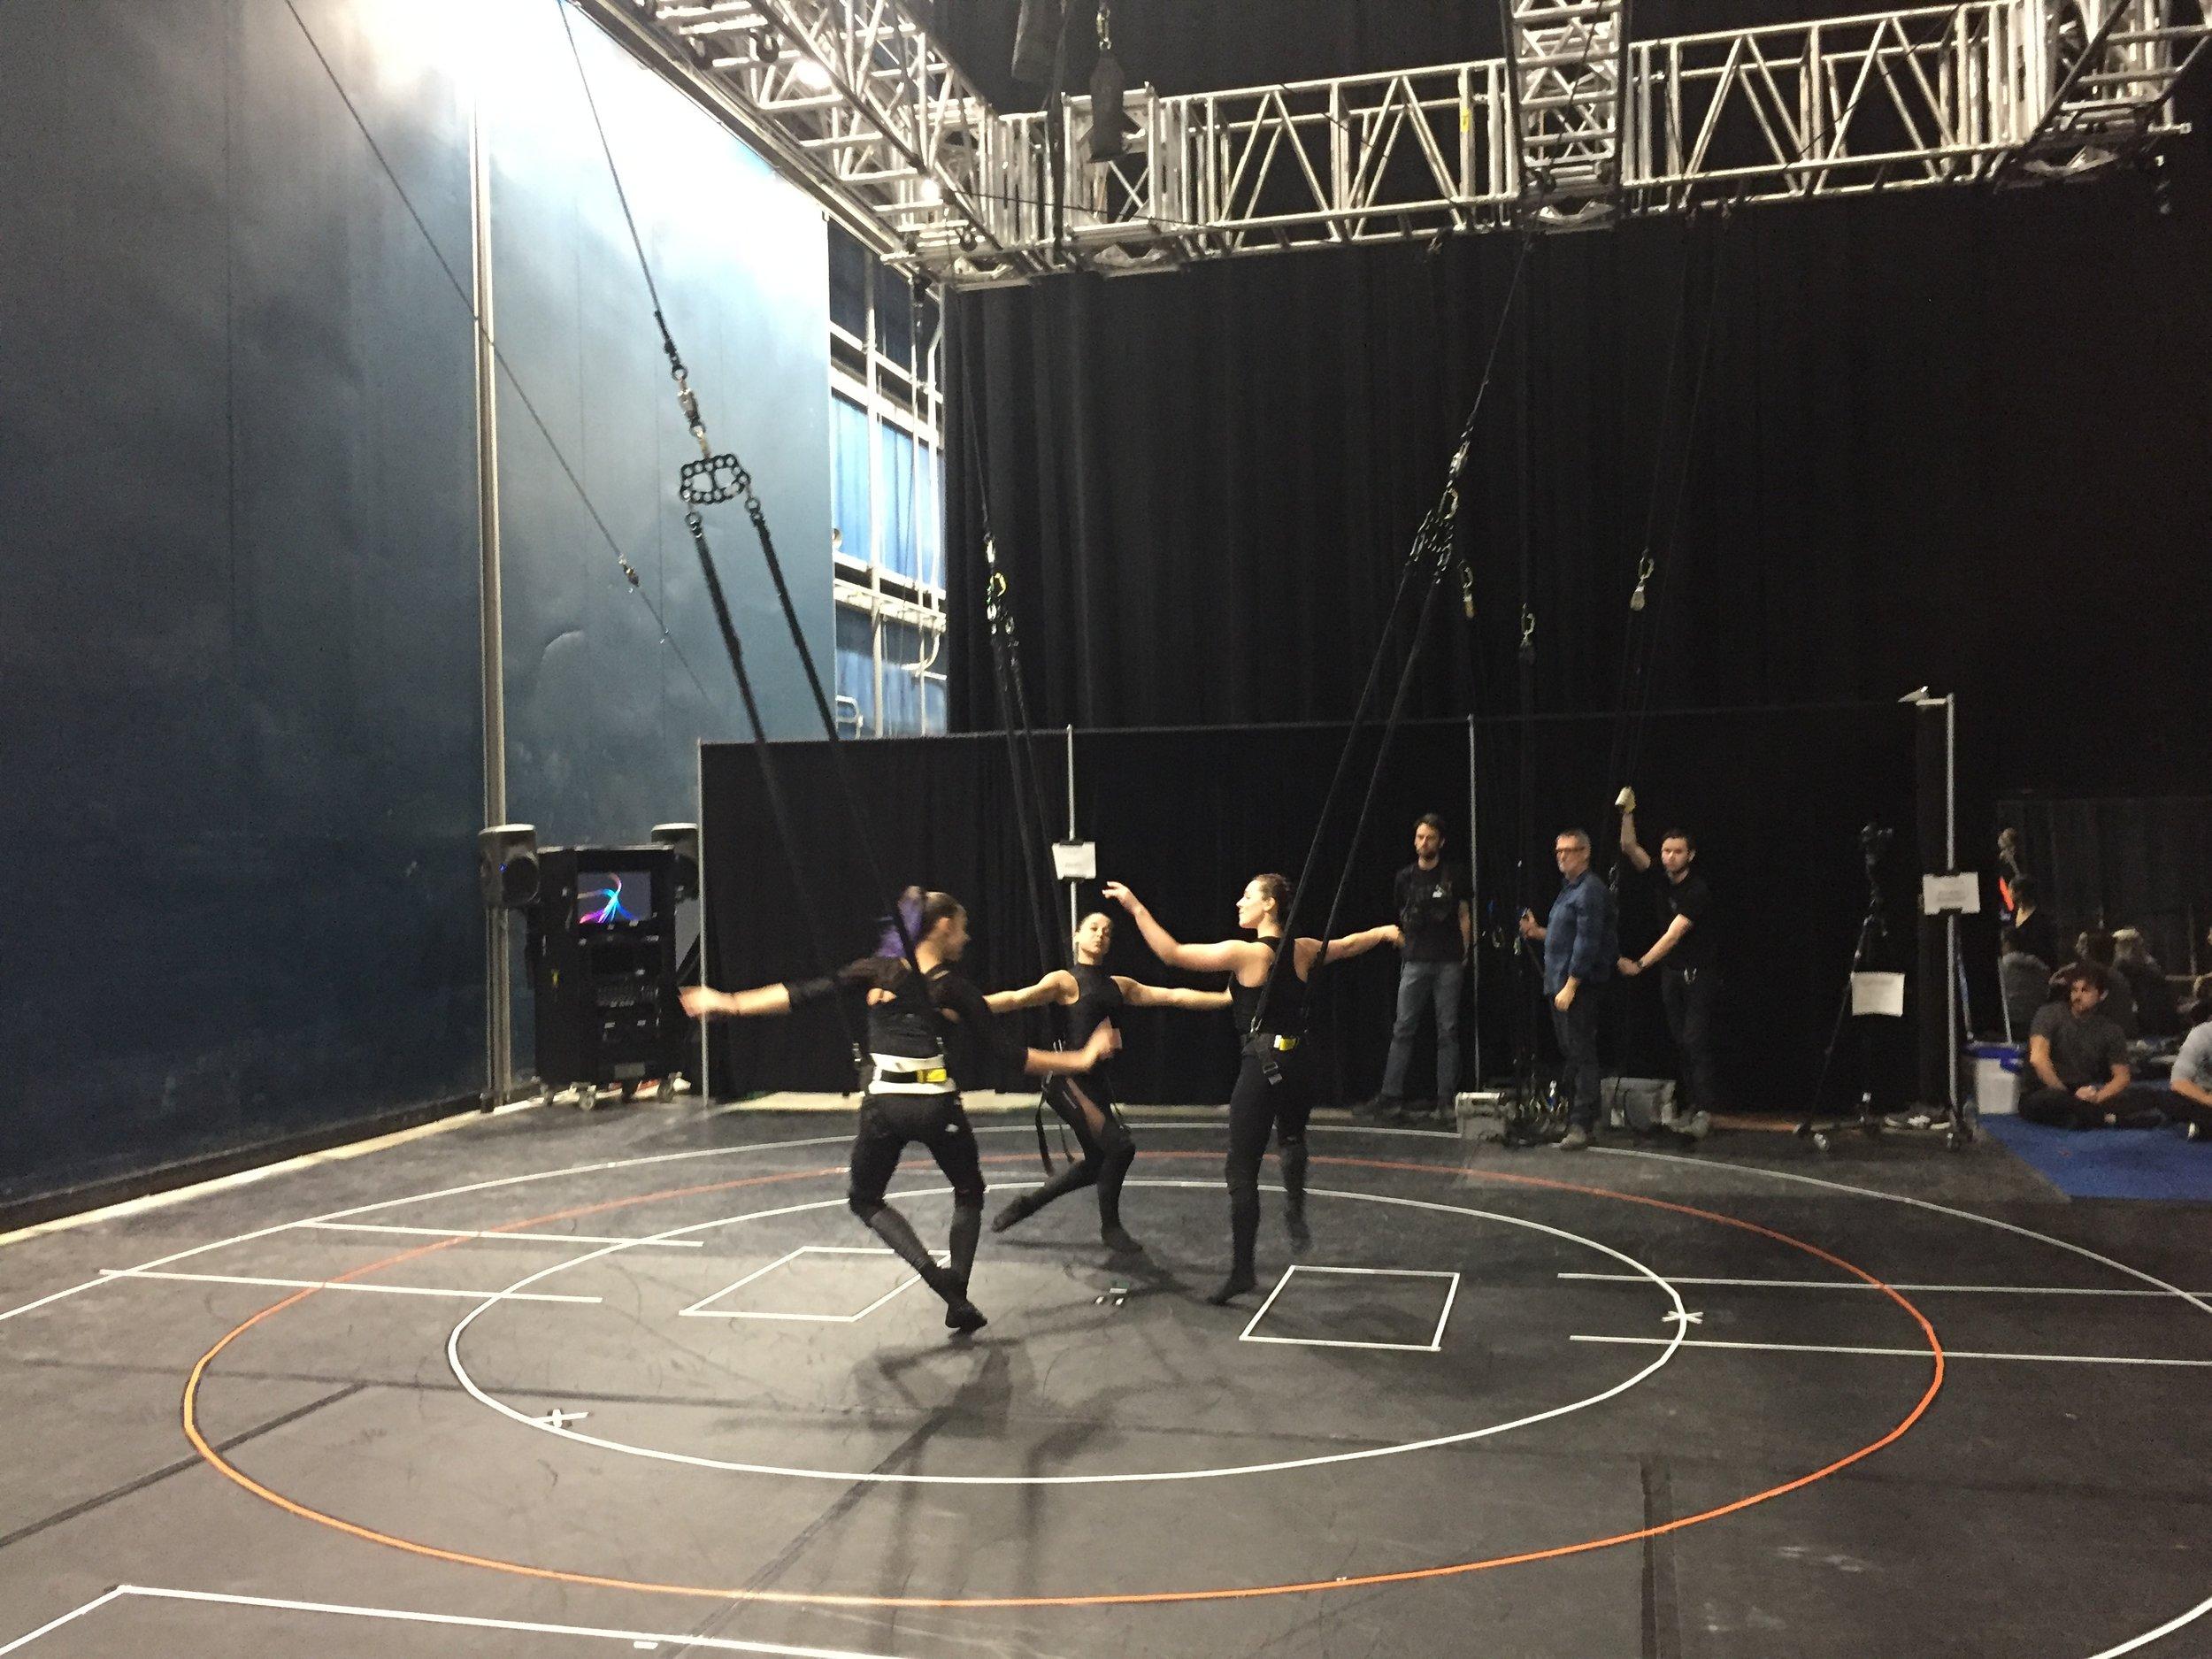 cirque du soleil show dance.JPG